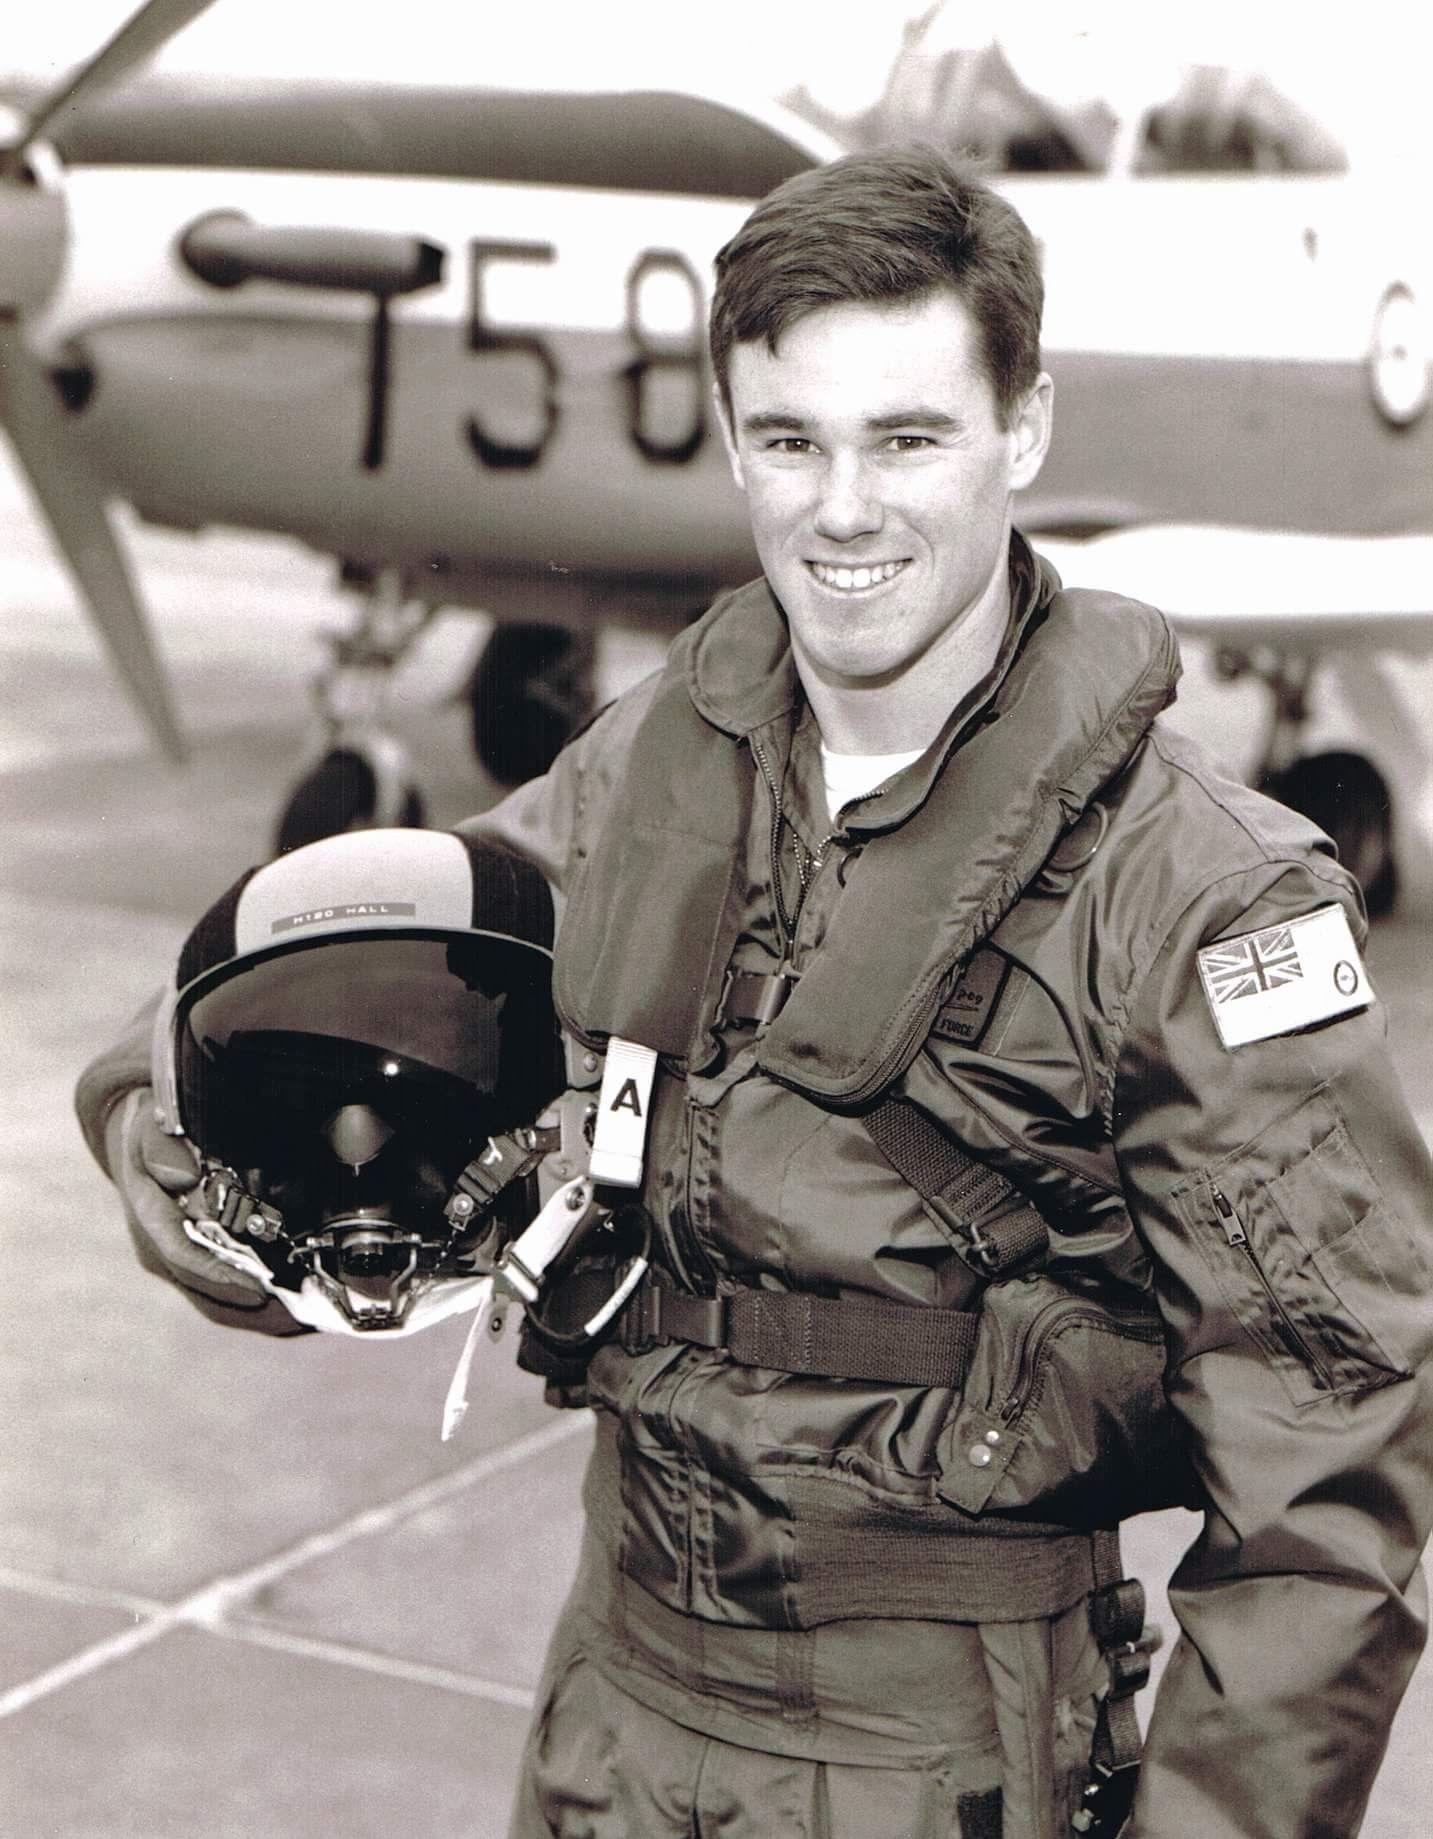 RAAF pilot now Redbull Air Racer; Matt Hall Royal